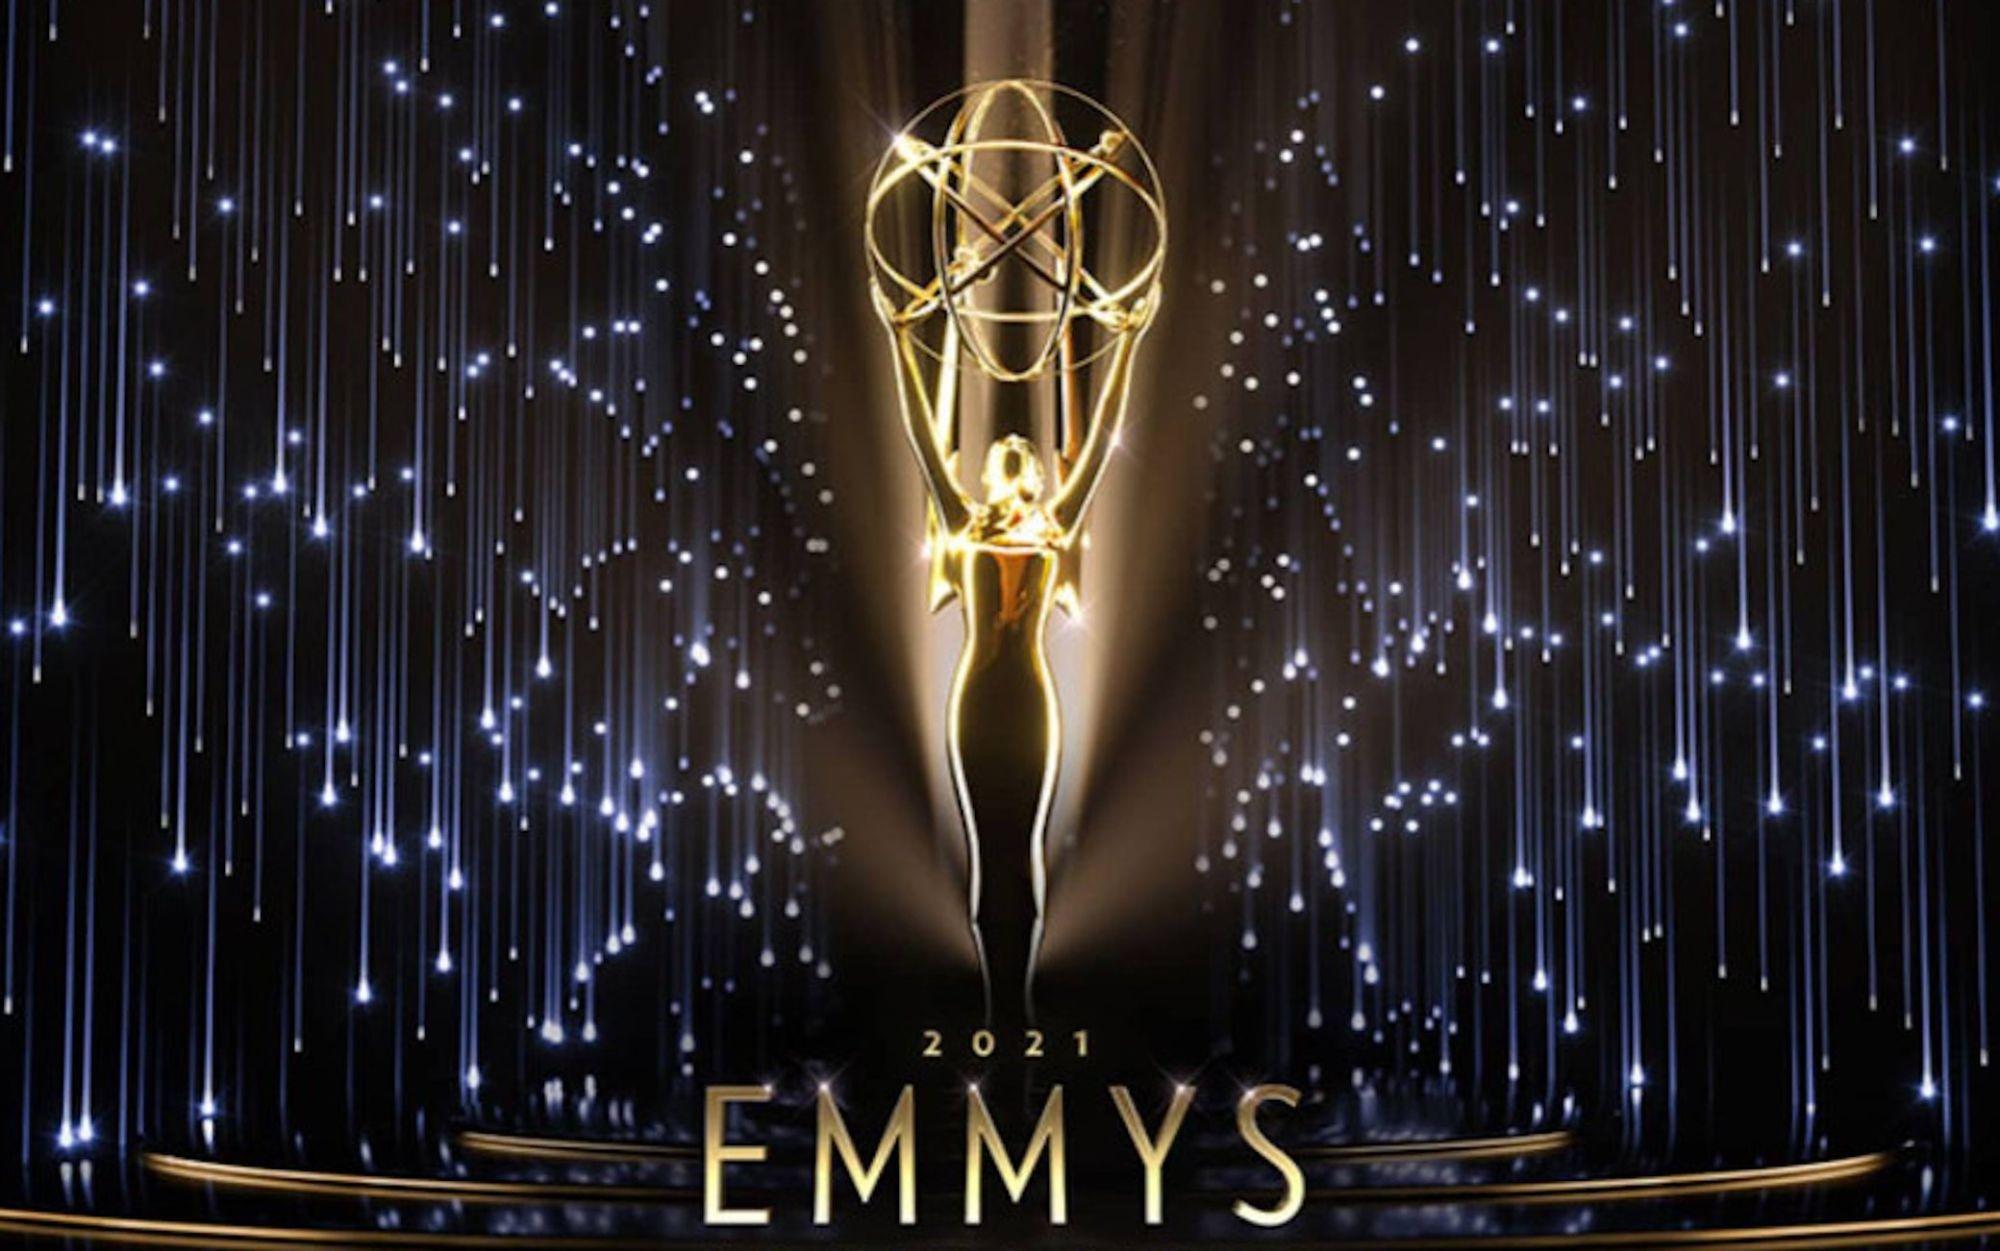 Emmy 2021: EmmySoWhite, ma c'è qualche premiazione da ricordare